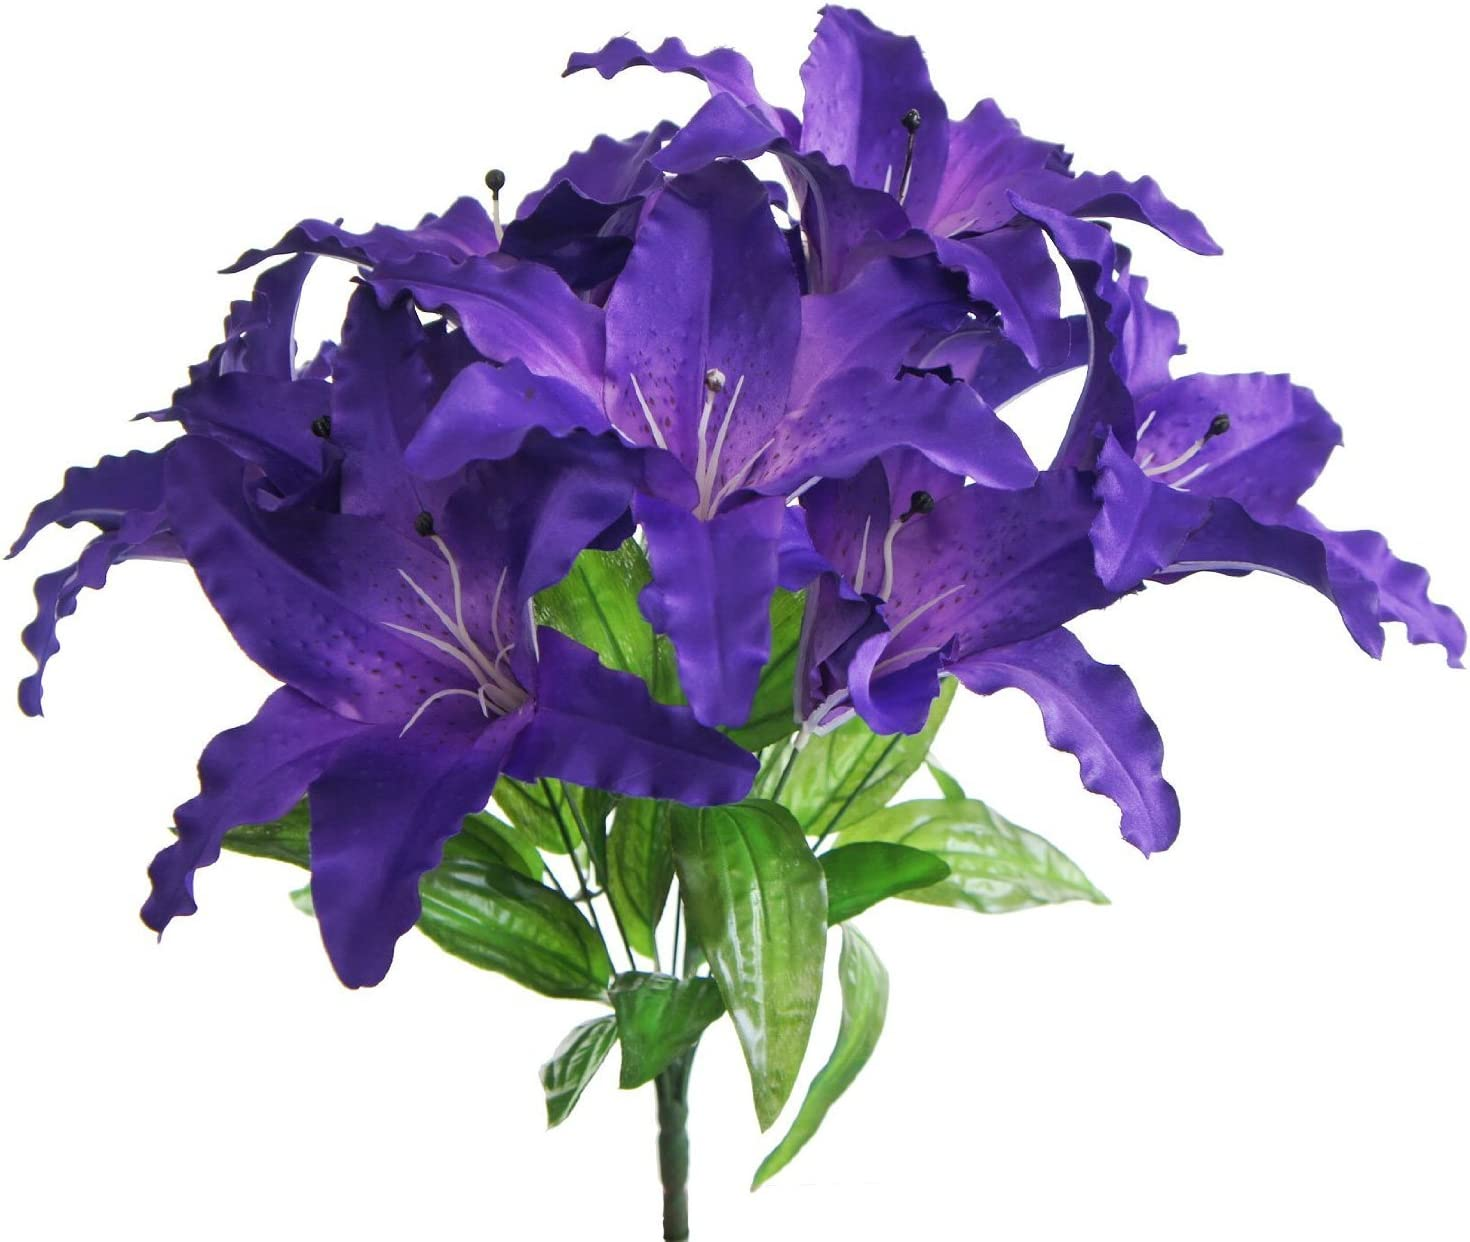 Lily Garden Large Tiger Lily 9-Head Silk Flowers Bush Bouquet Artificial (Purple)